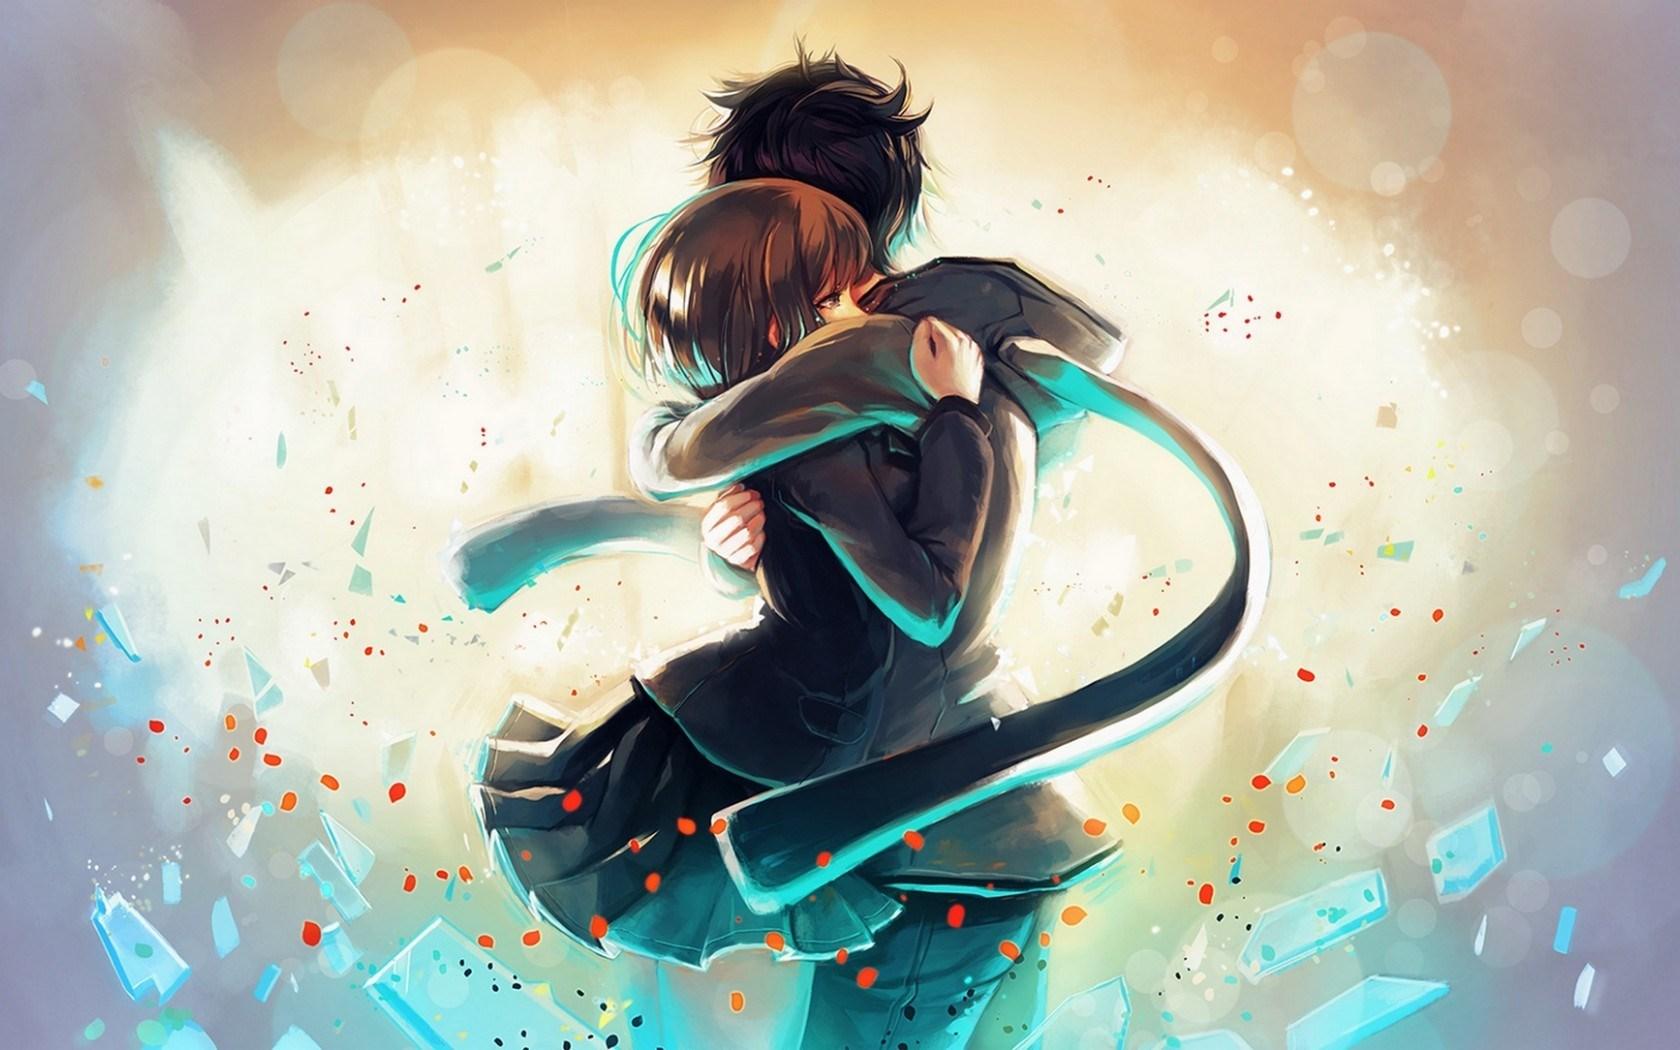 Anime boy girl hug